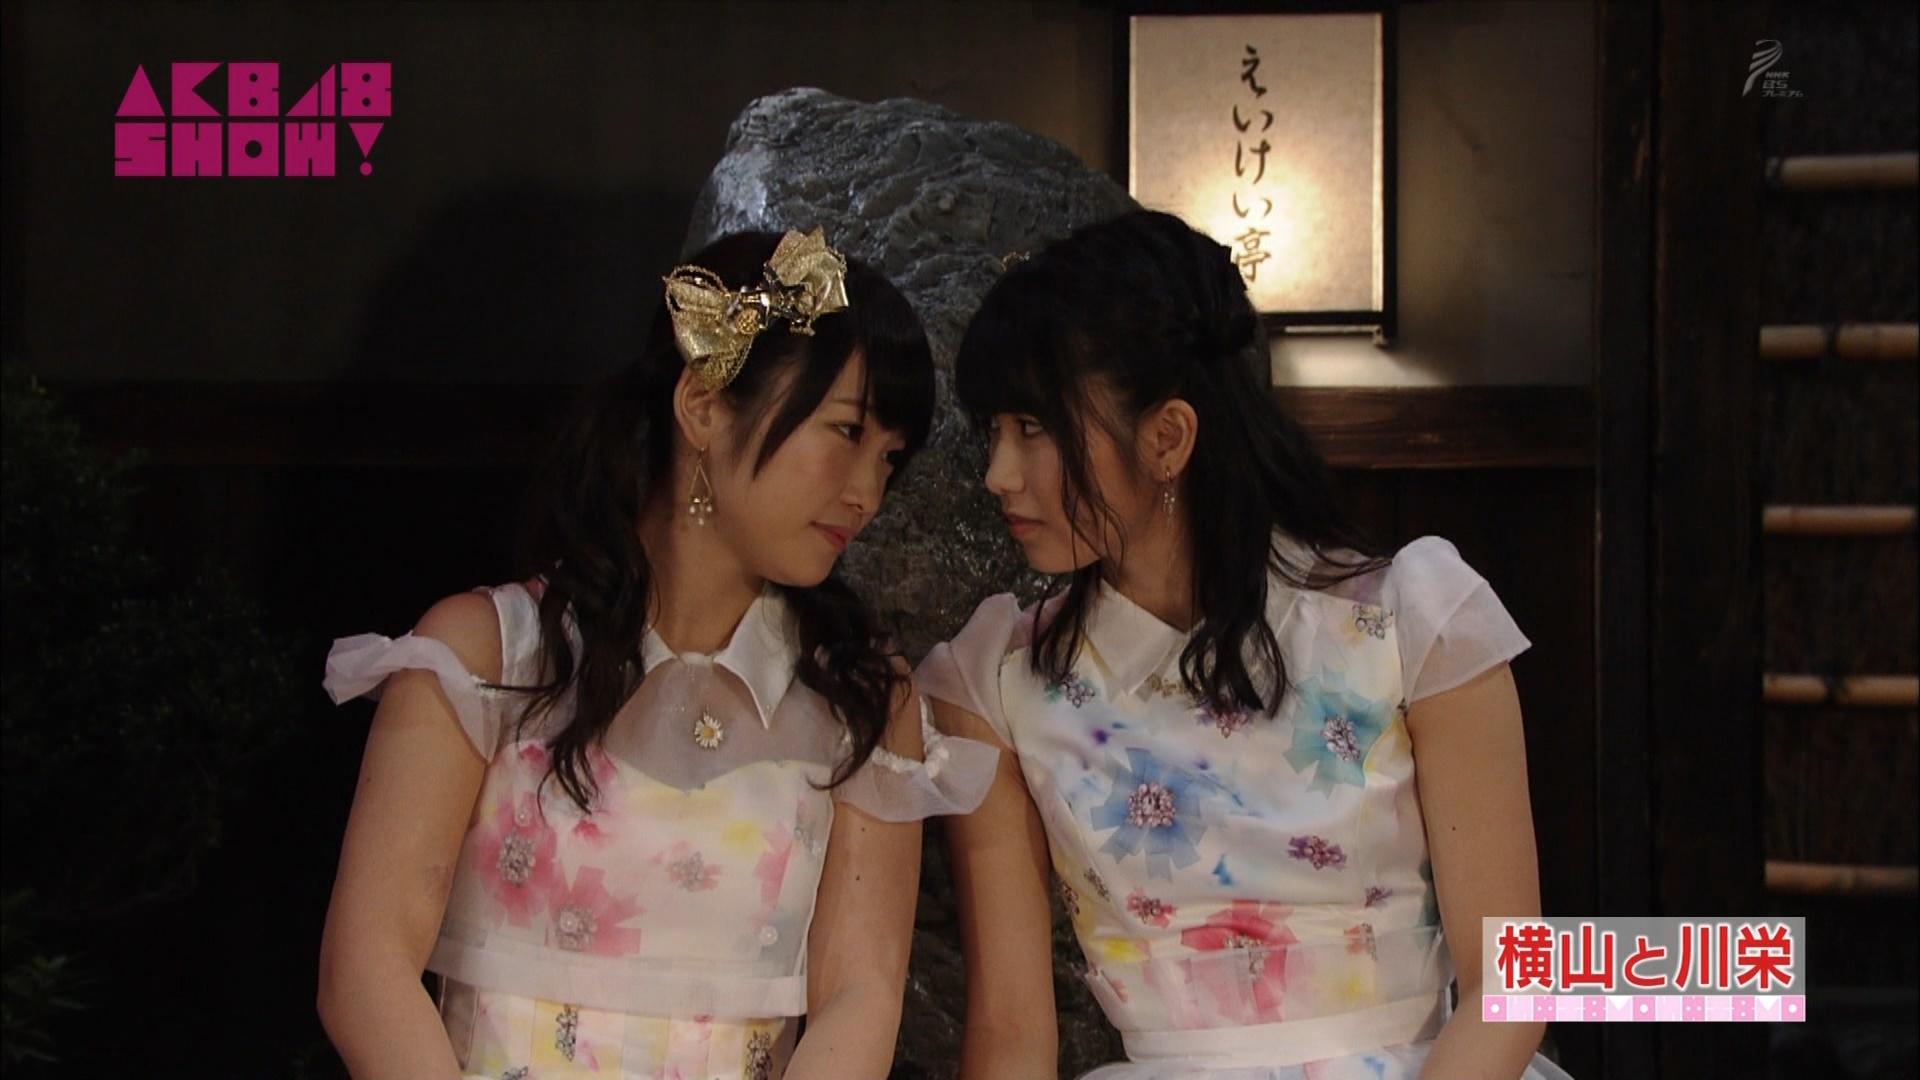 横山由依と川栄李奈 AKB48SHOW! 20140906 (38)